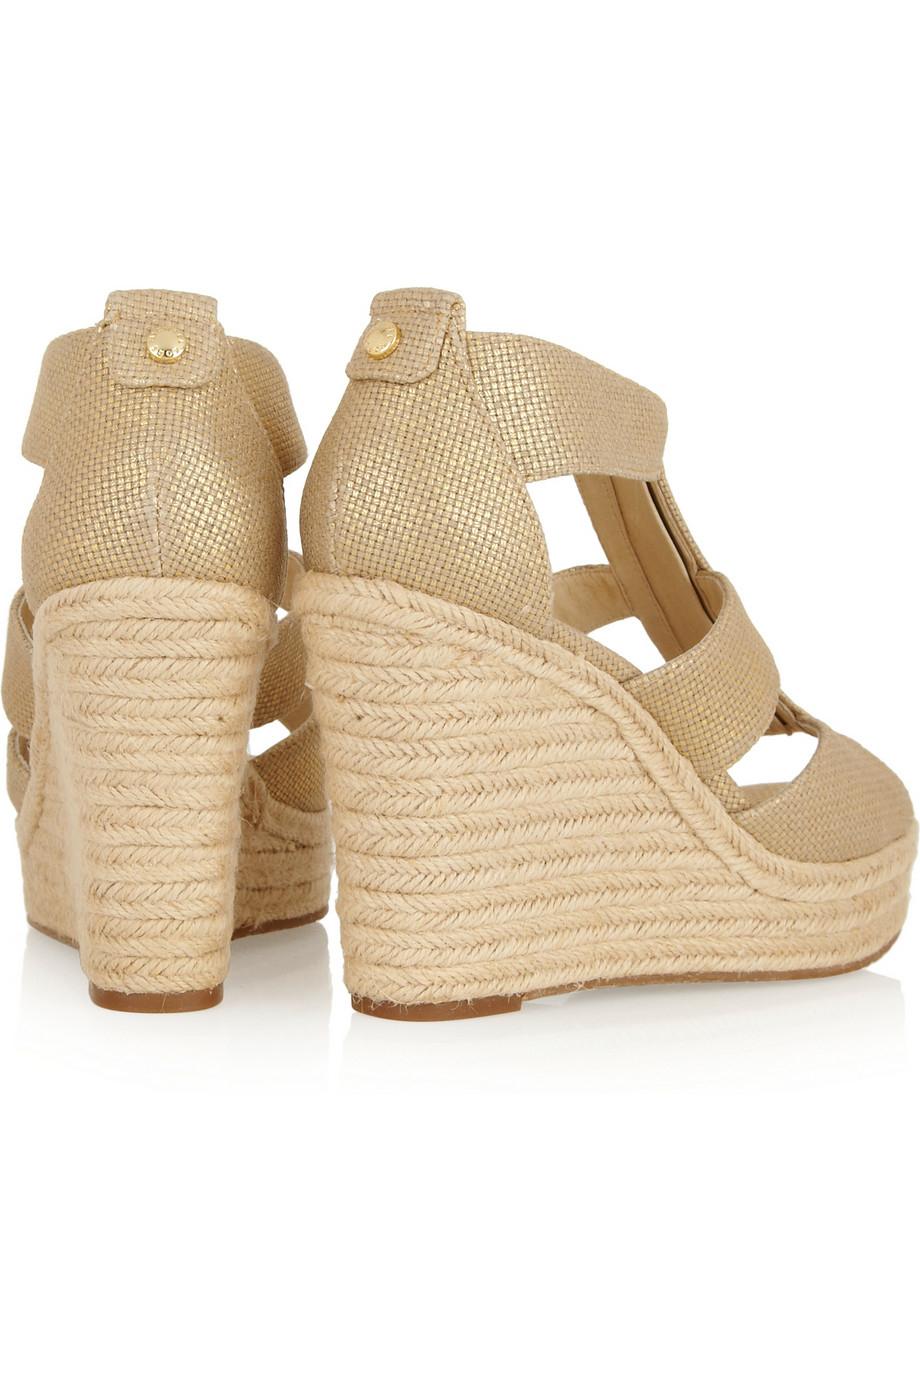 b6d742cec70 MICHAEL Michael Kors Damita Metallic Canvas Wedge Sandals